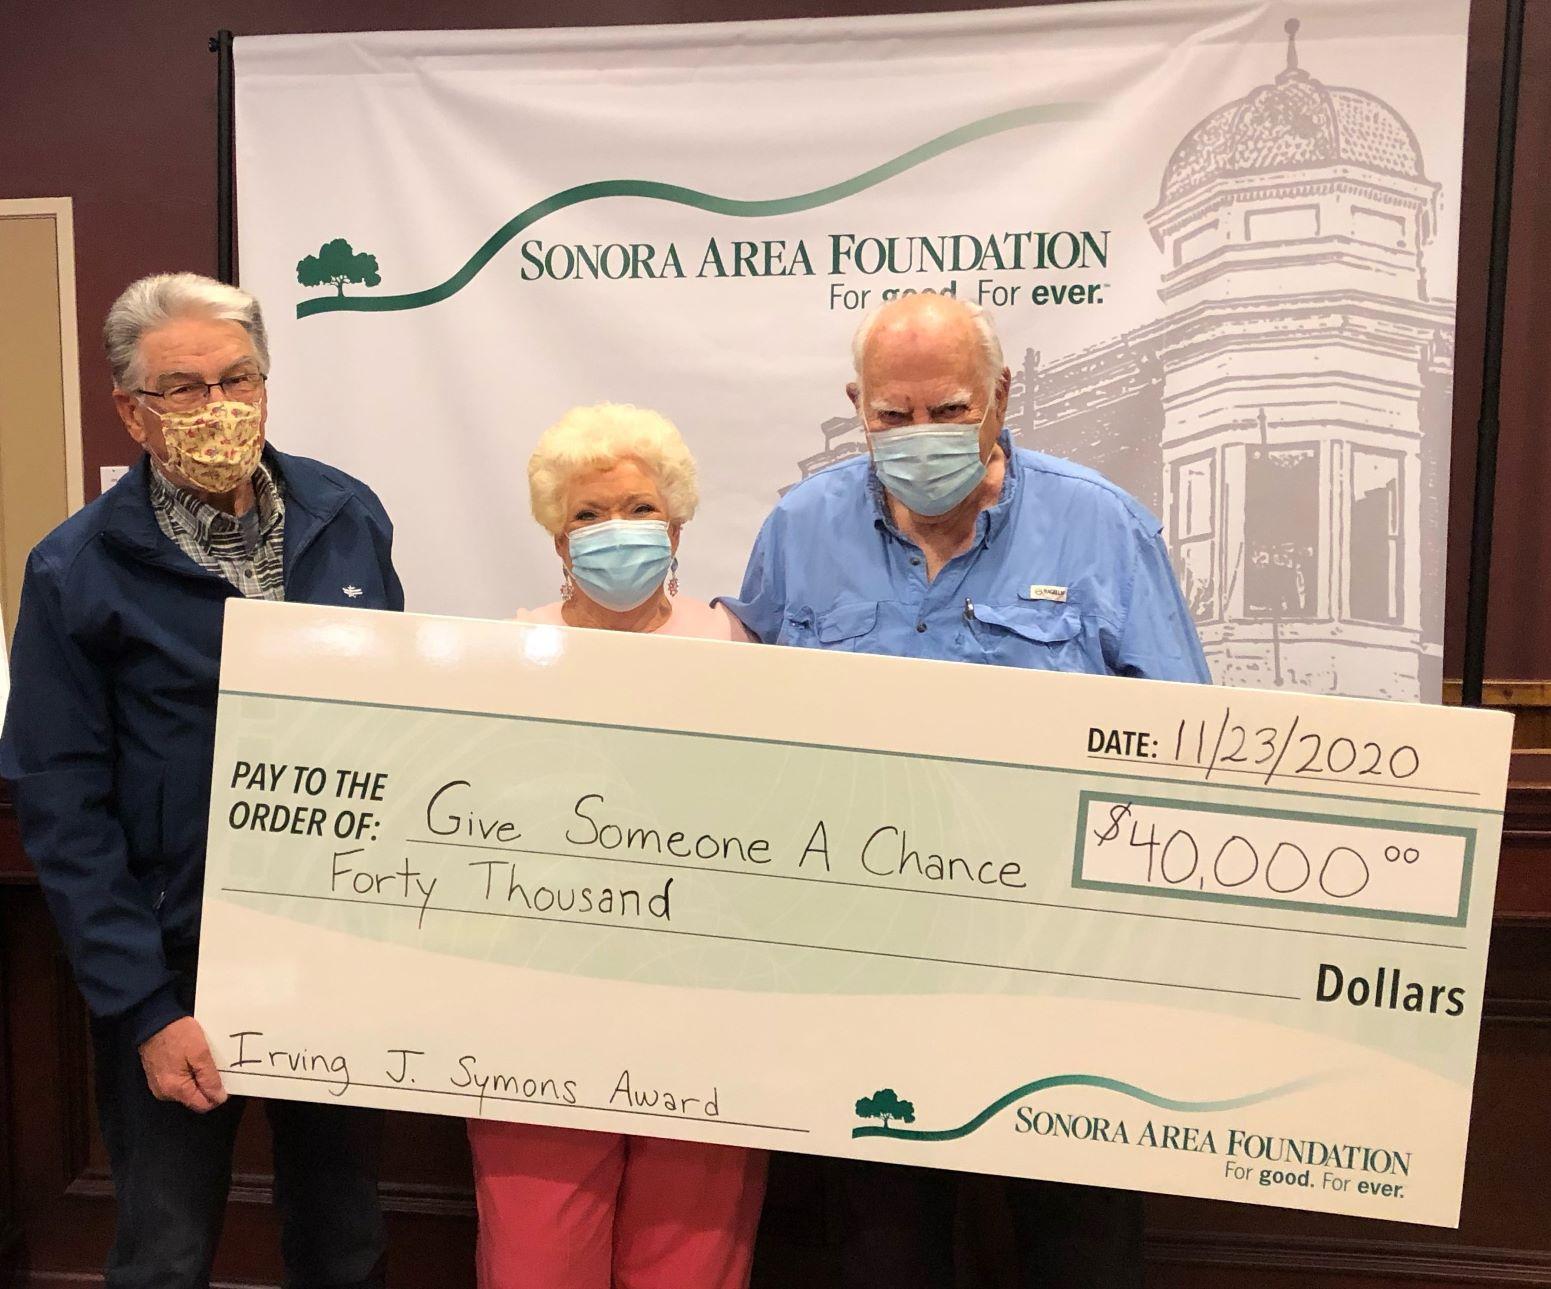 Homeless Support Organization Receives Surprise Irving J. Symons